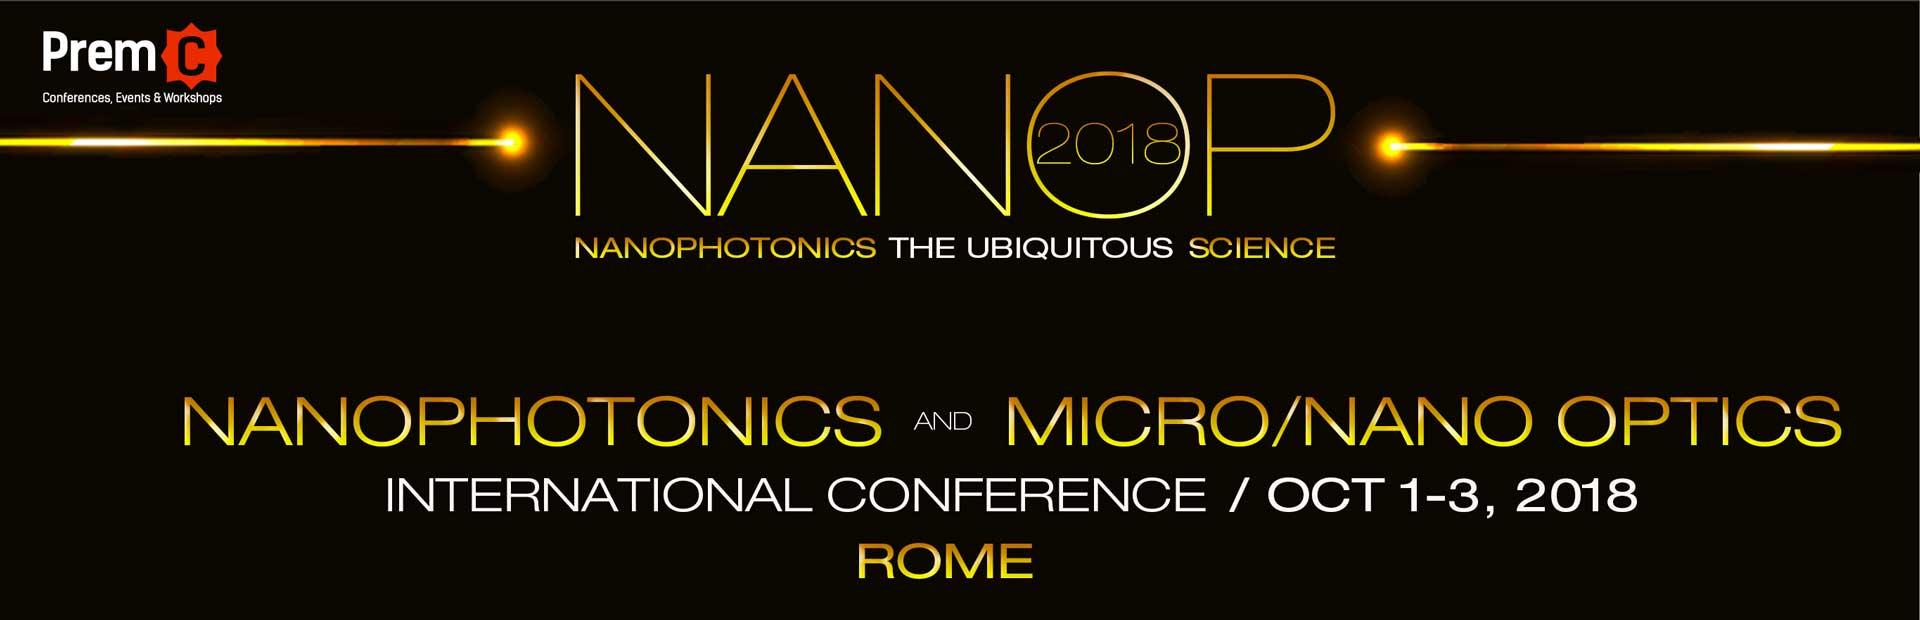 Nanophotonics and Micro/Nano Optics International Conference 2018 banner